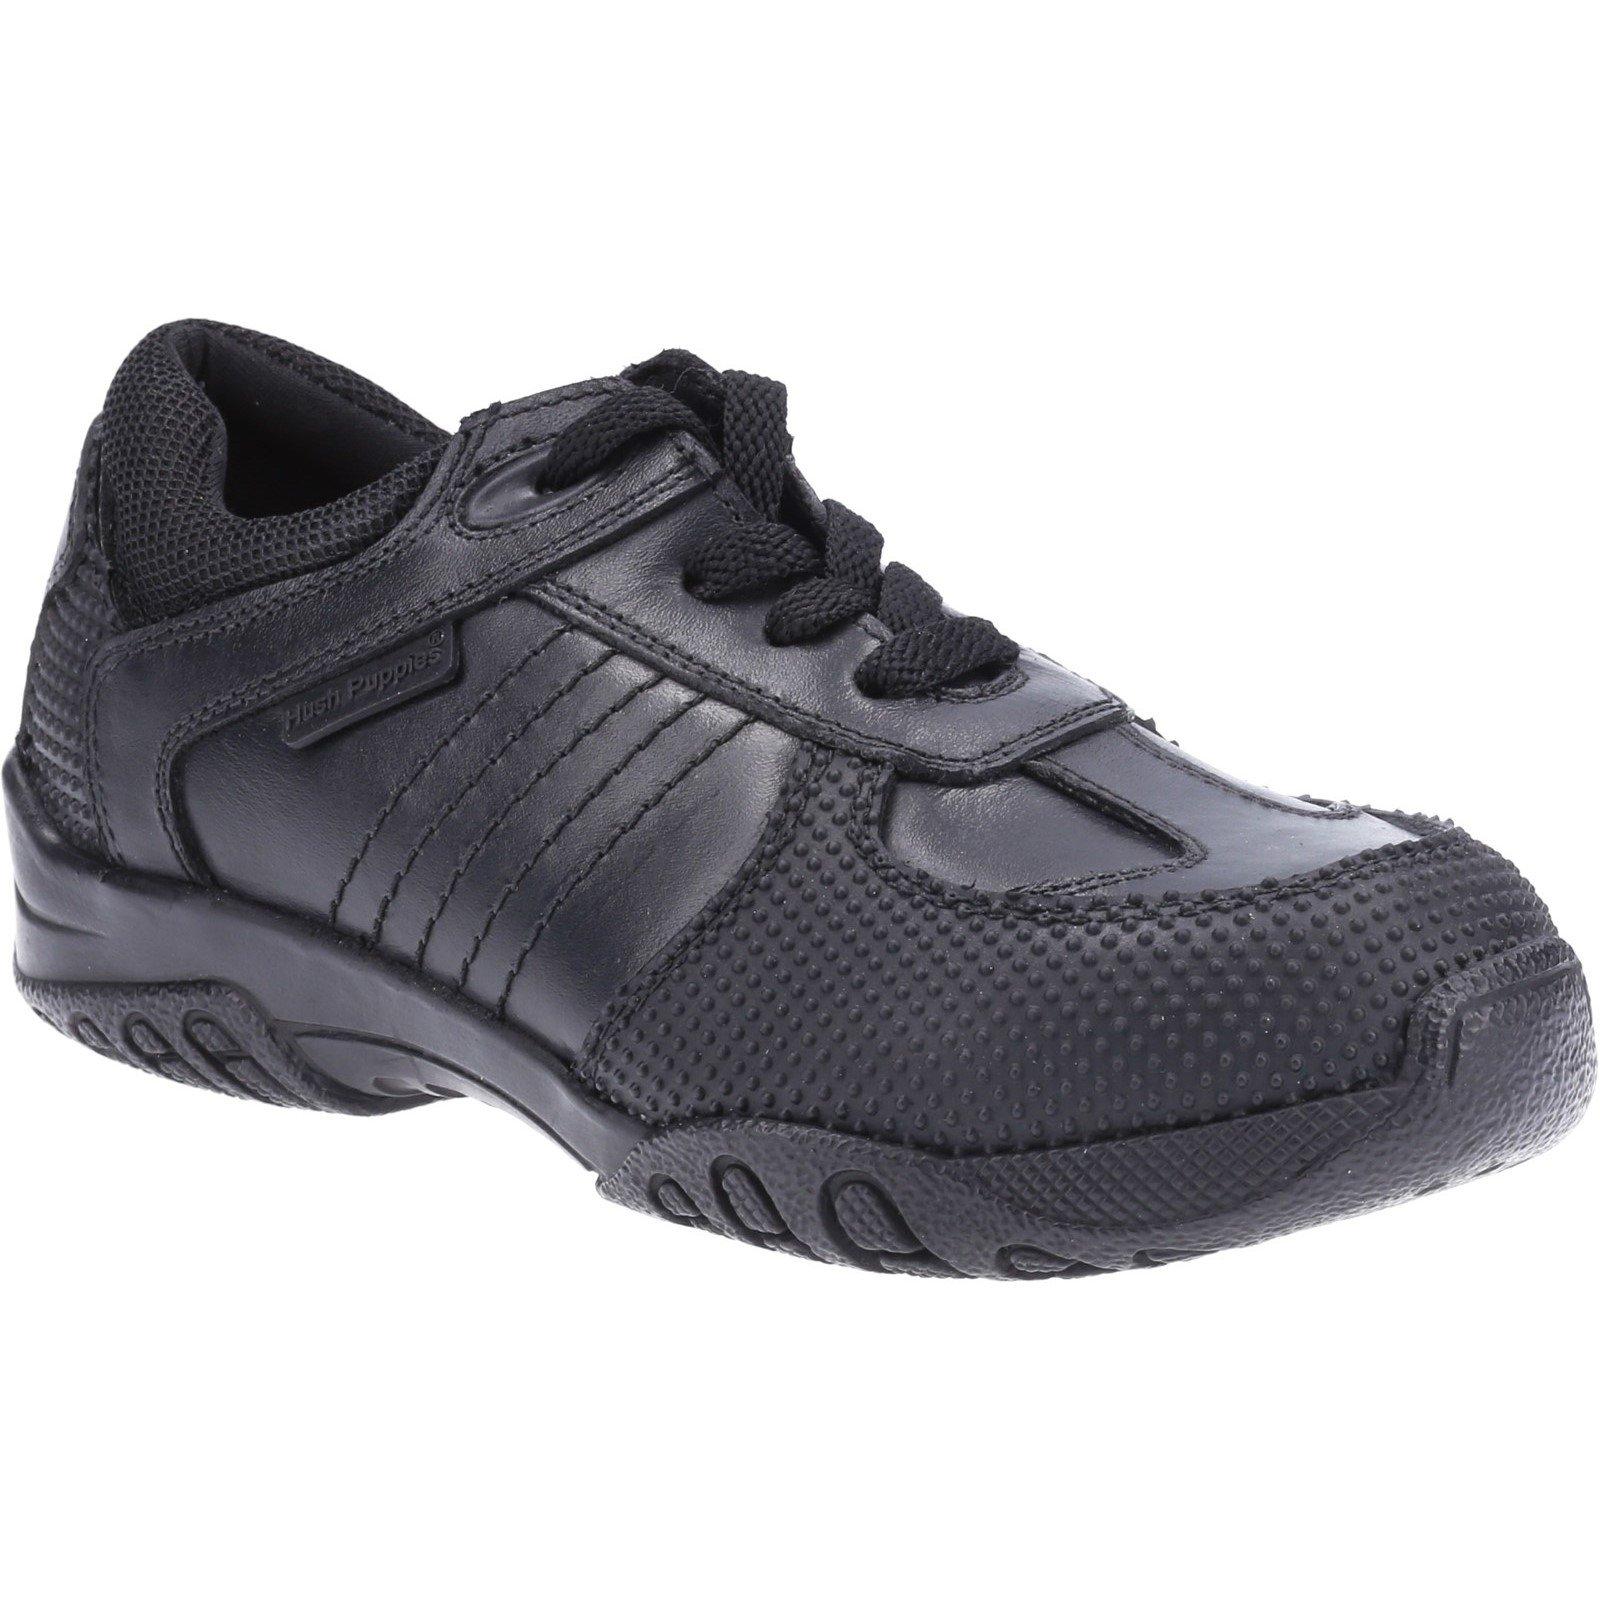 Hush Puppies Kid's Jezza Junior School Shoe Black 32587 - Black 10.5